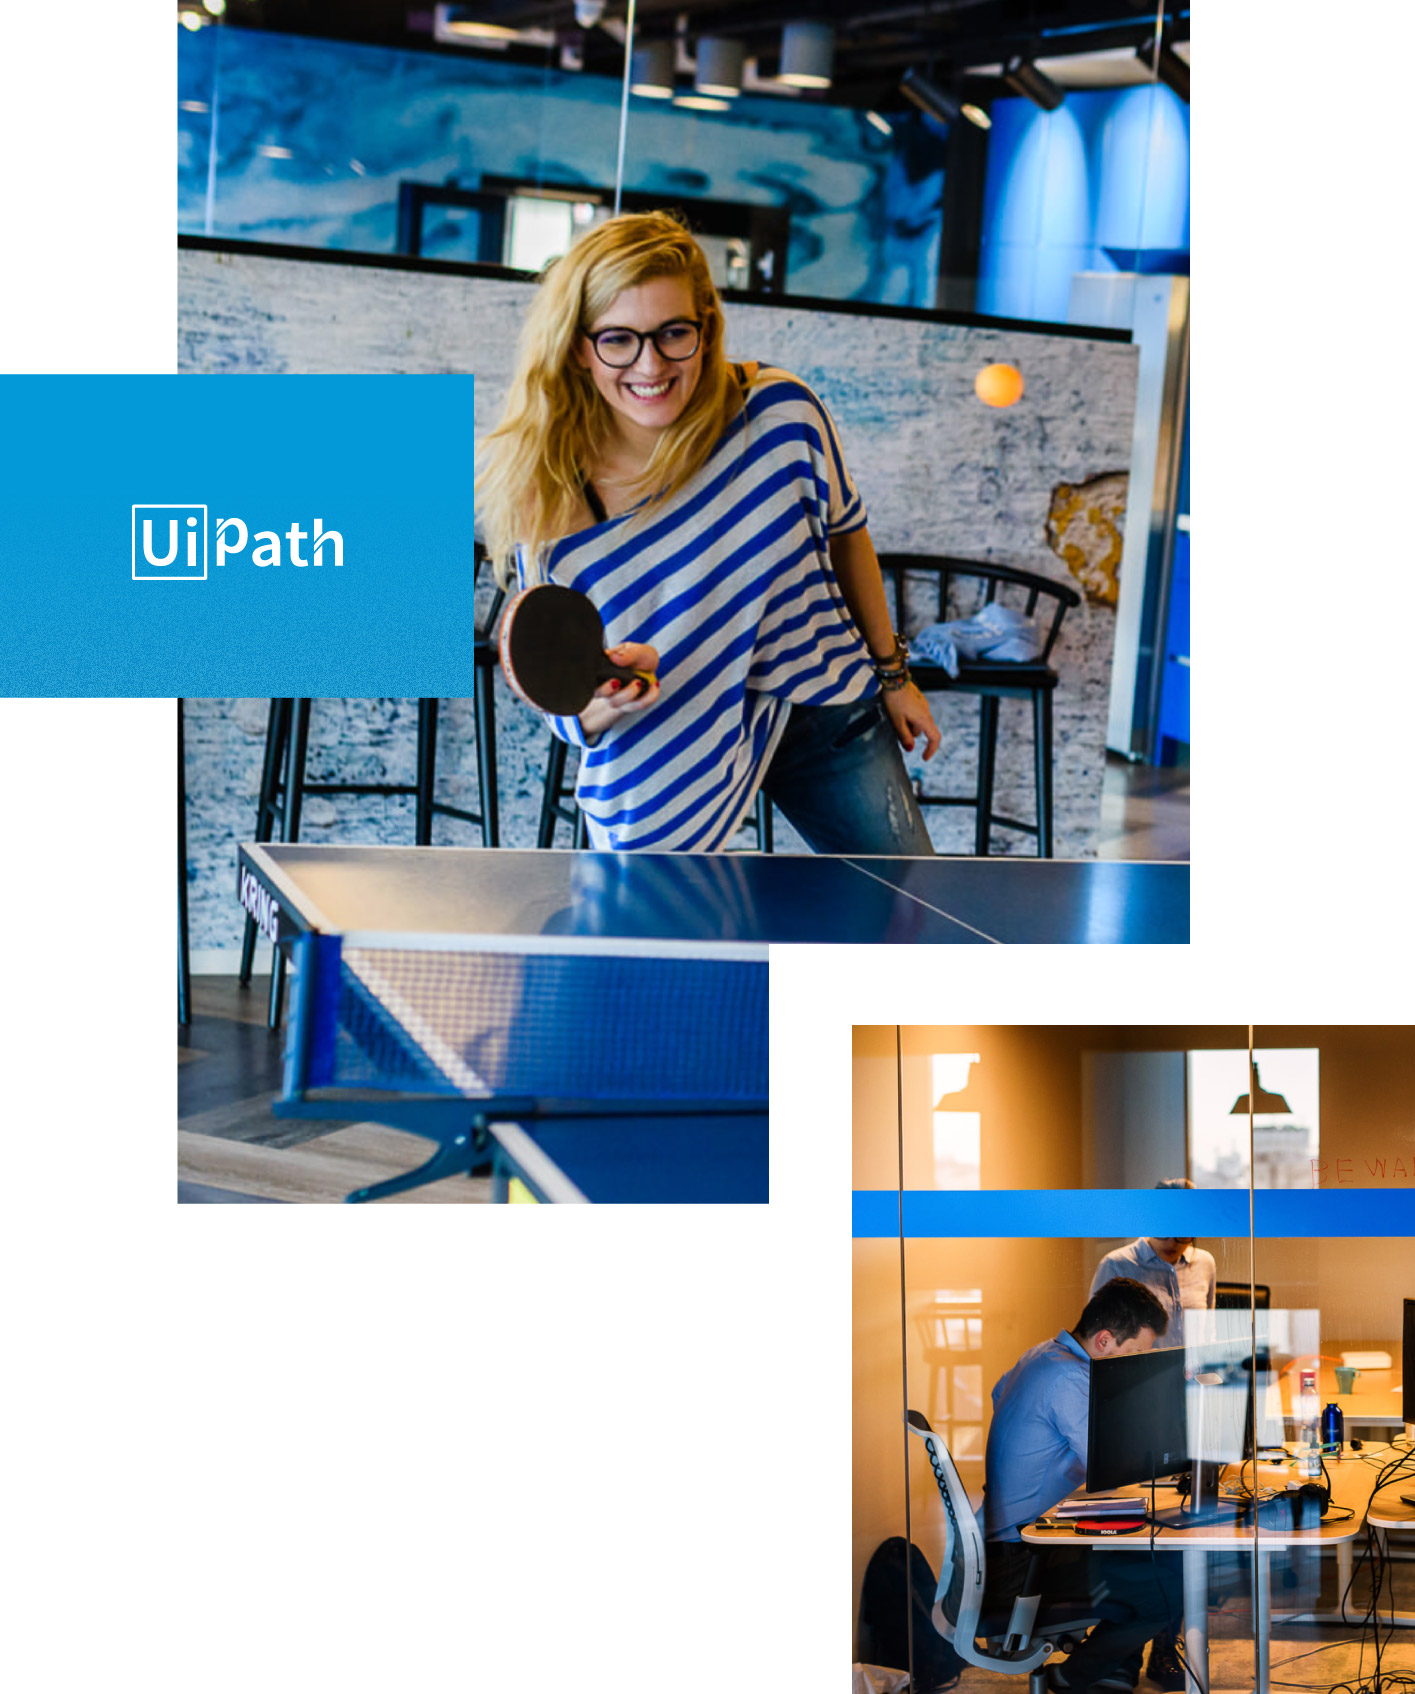 UiPath-3